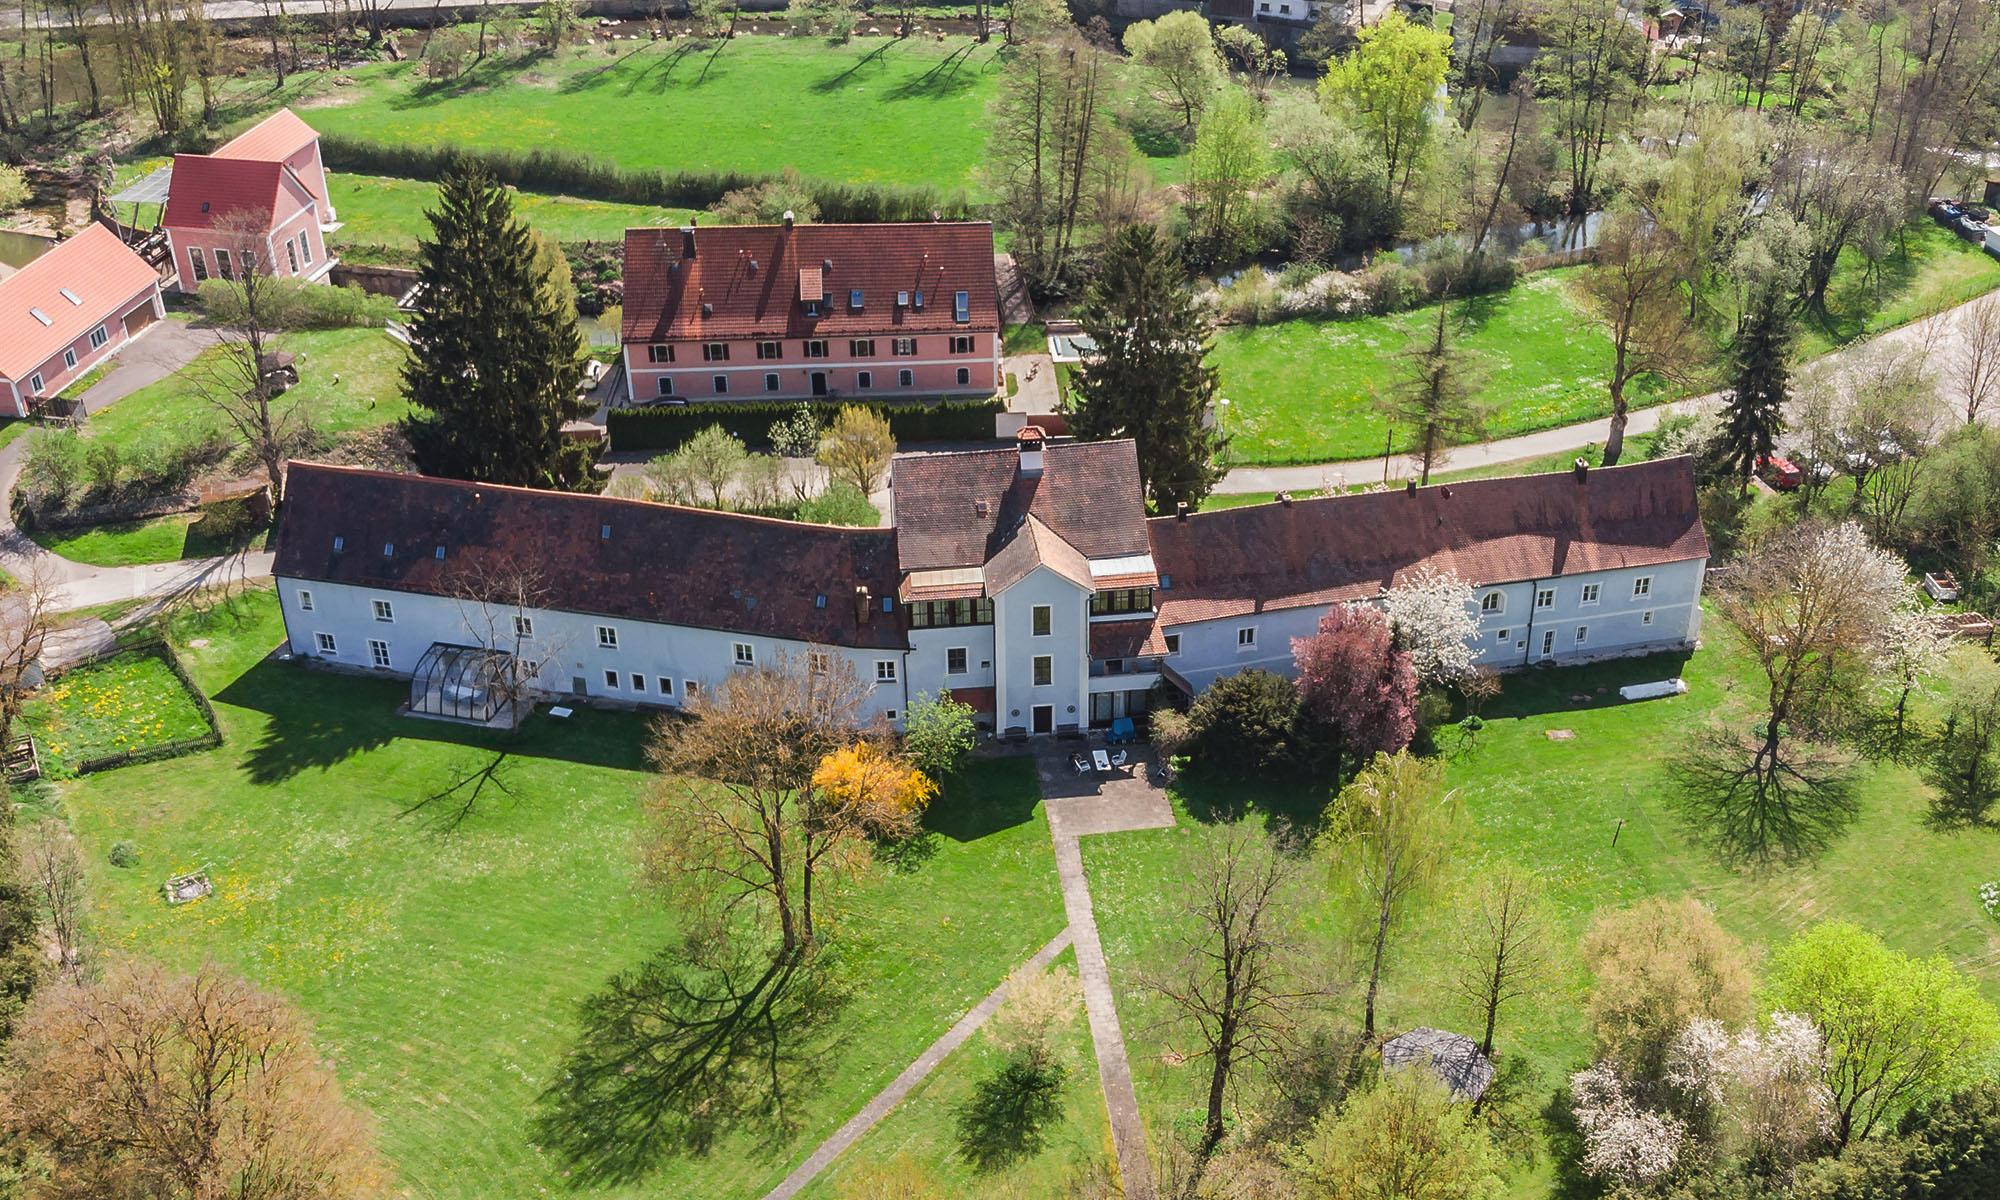 Hammerschloss Traidendorf